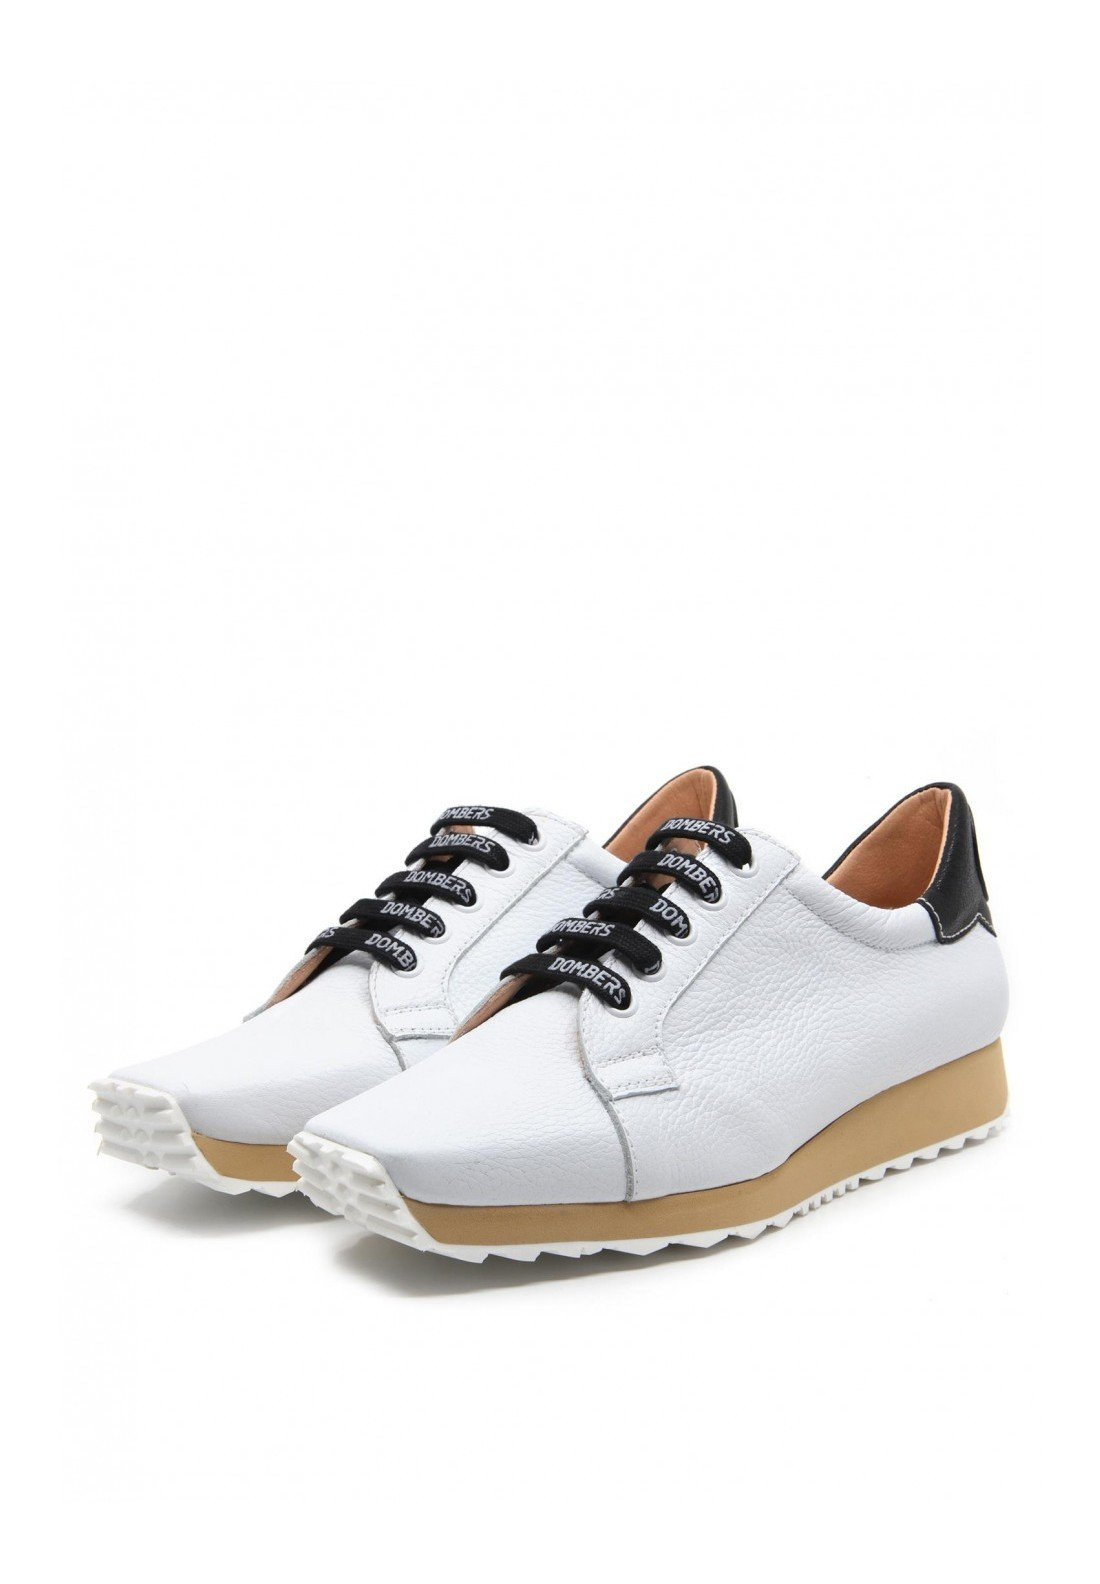 Gutes Angebot DOMBERS INNOVATE - Sneaker low - blanco | Damenbekleidung 2020